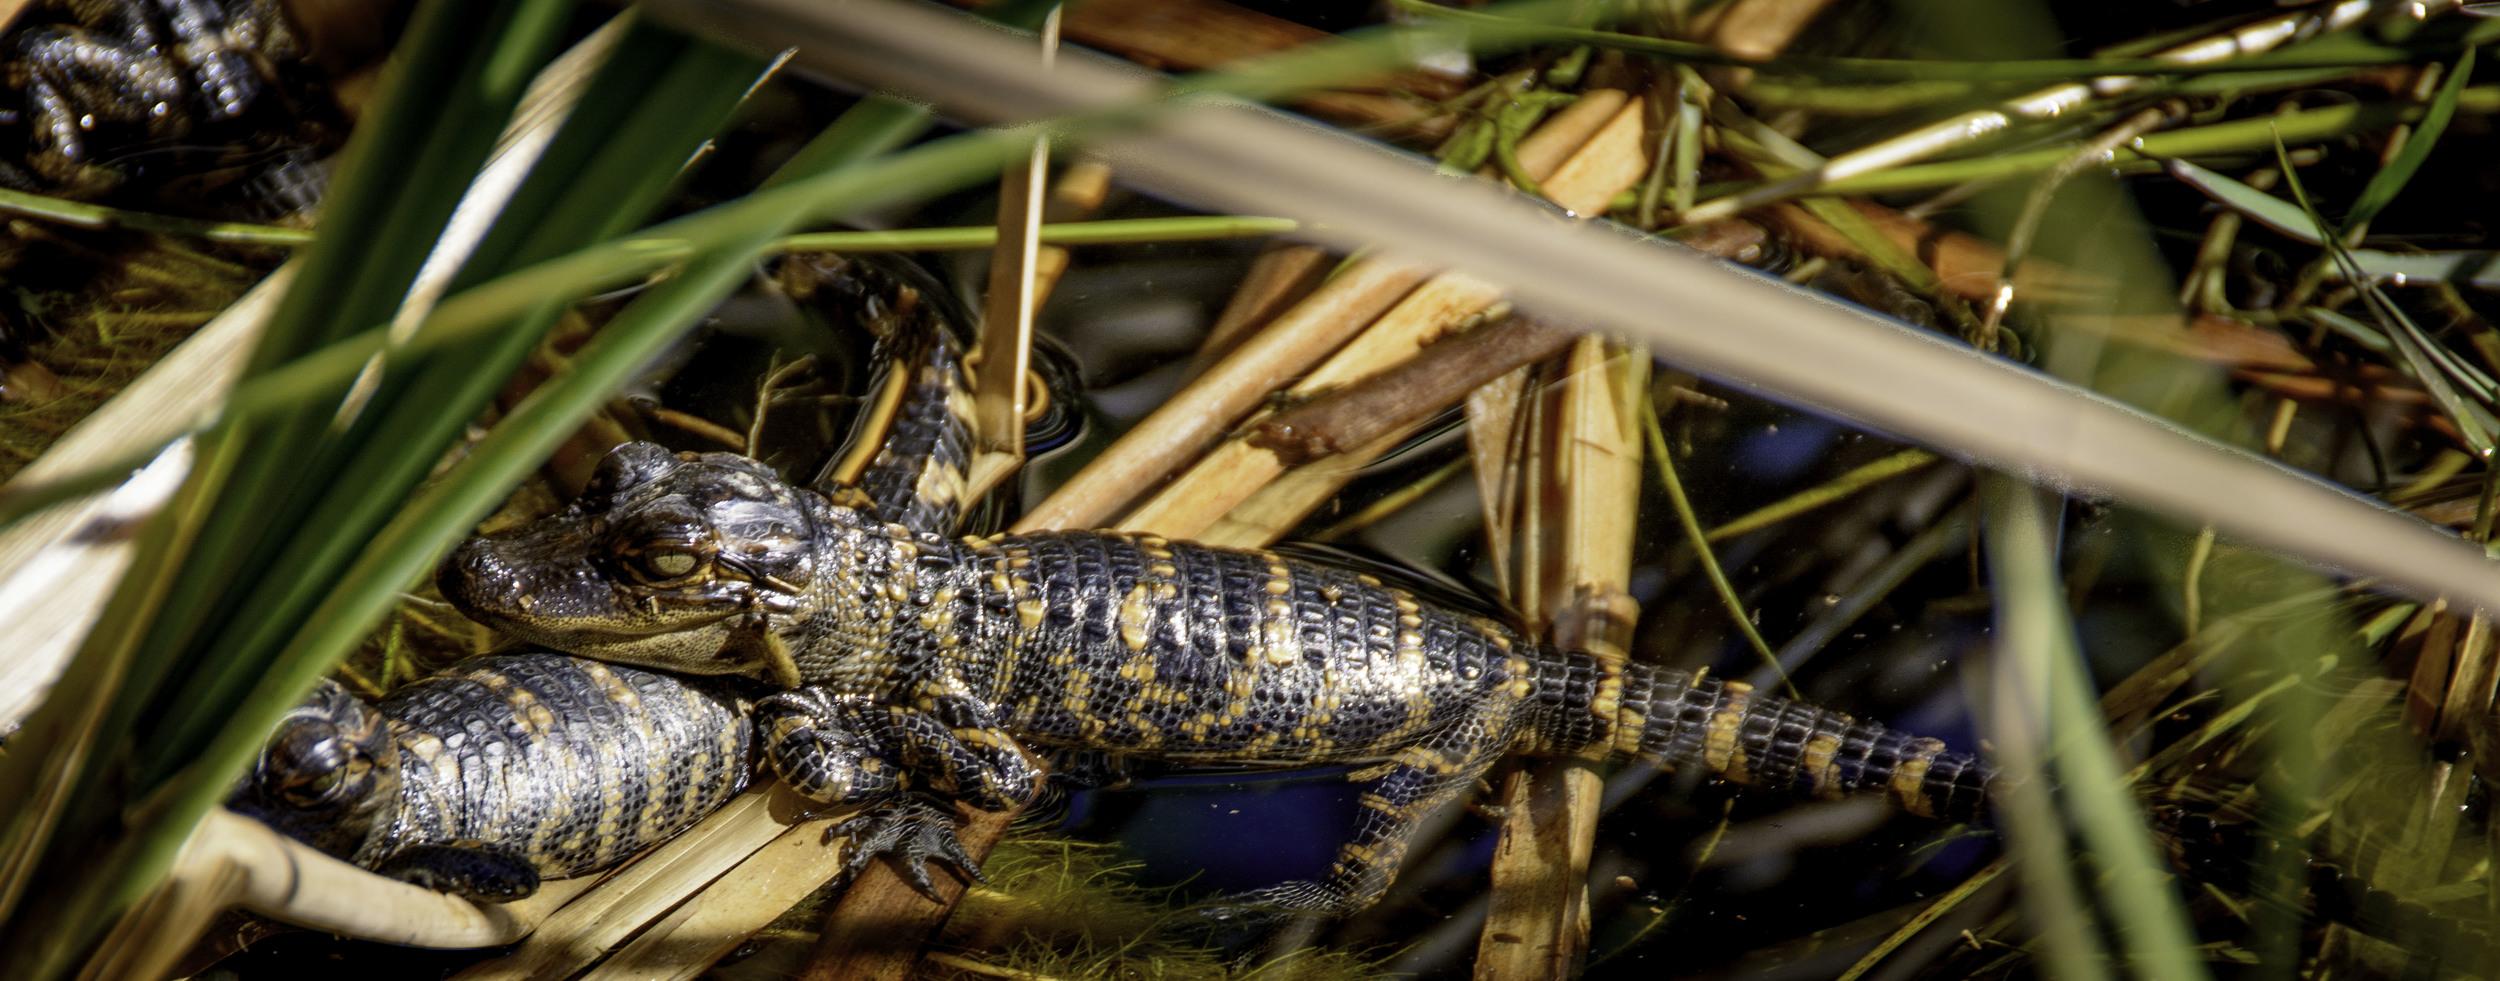 Everglades_20140217_064.jpg